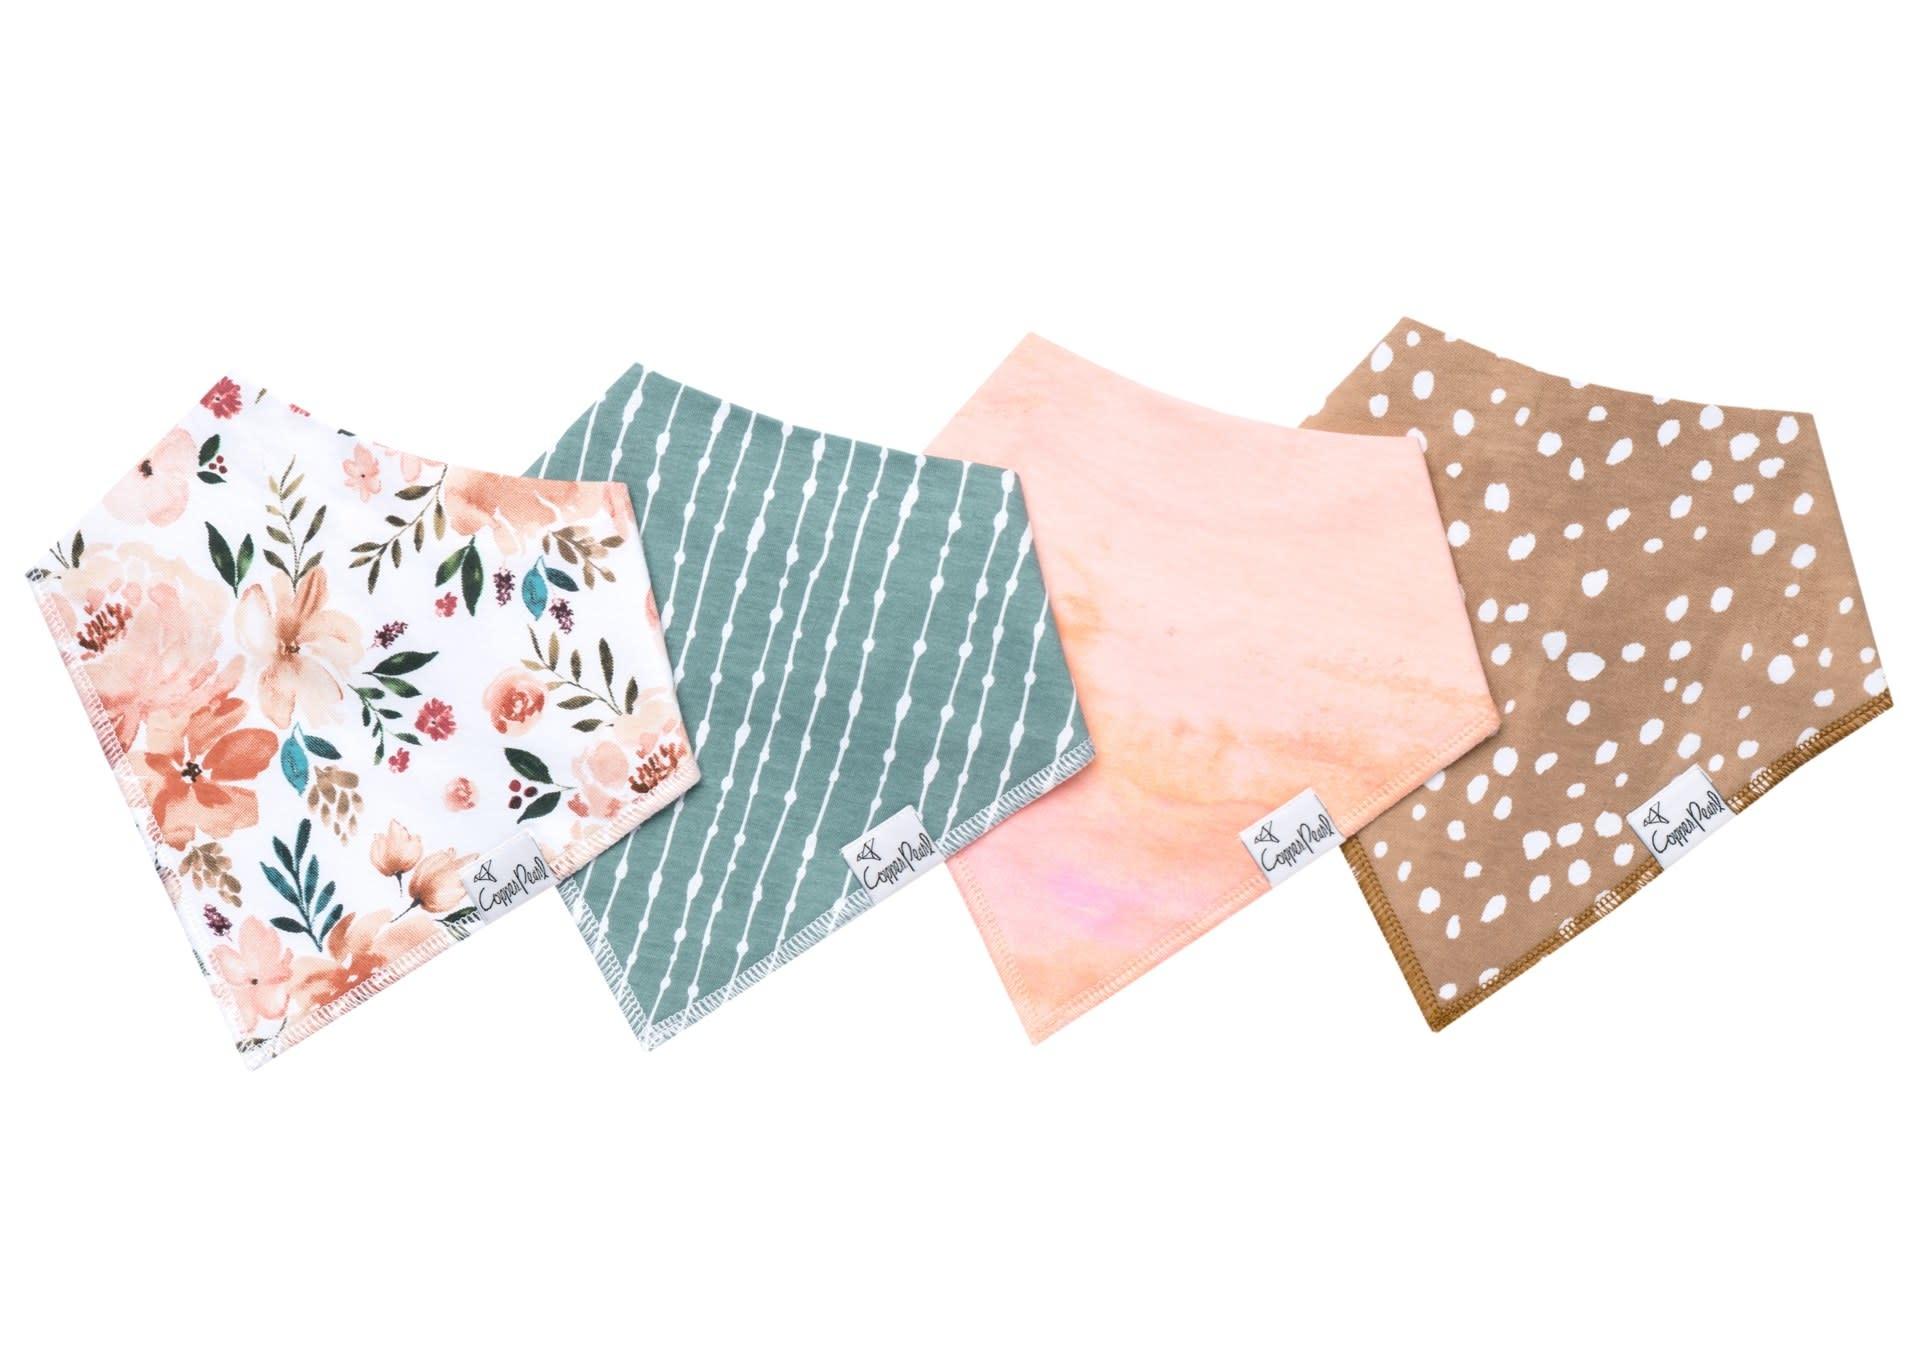 Copper Pearl Bibs - Autumn Set - 4 pack